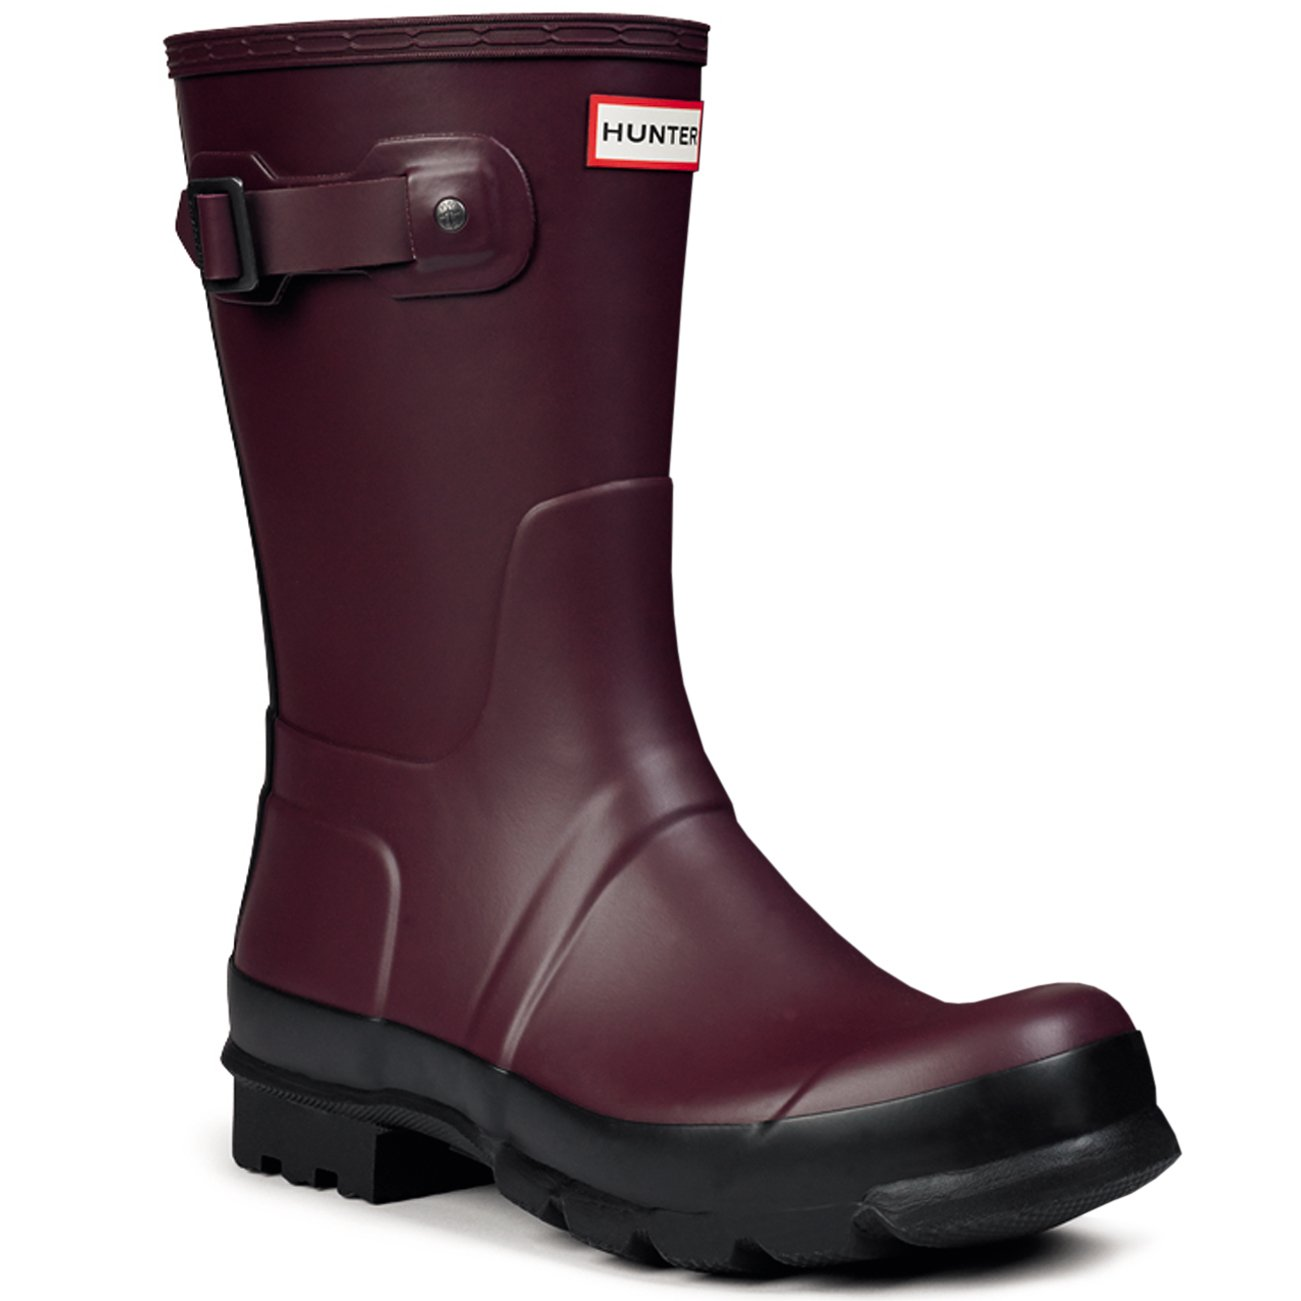 Mens Hunter Original Two Toned Short Snow Winter Wellingtons Rain Boots - Burgundy - 8